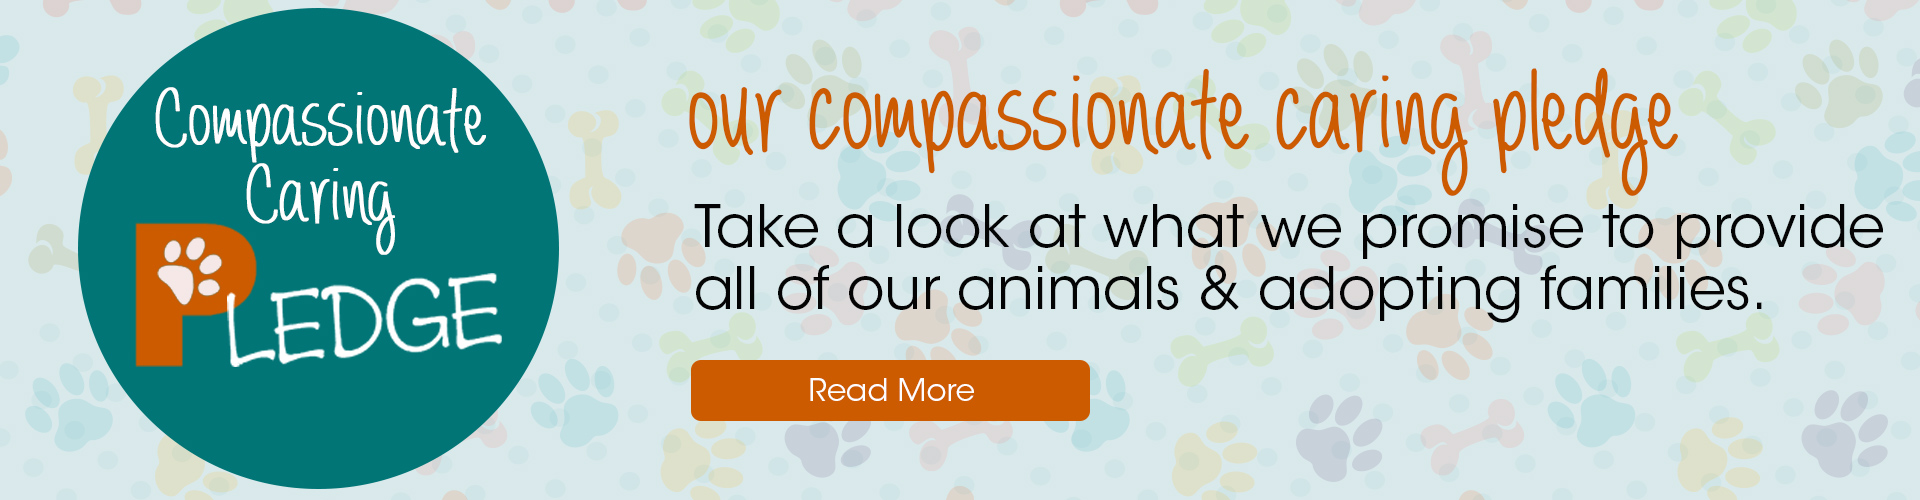 Compassionate Caring Pledge